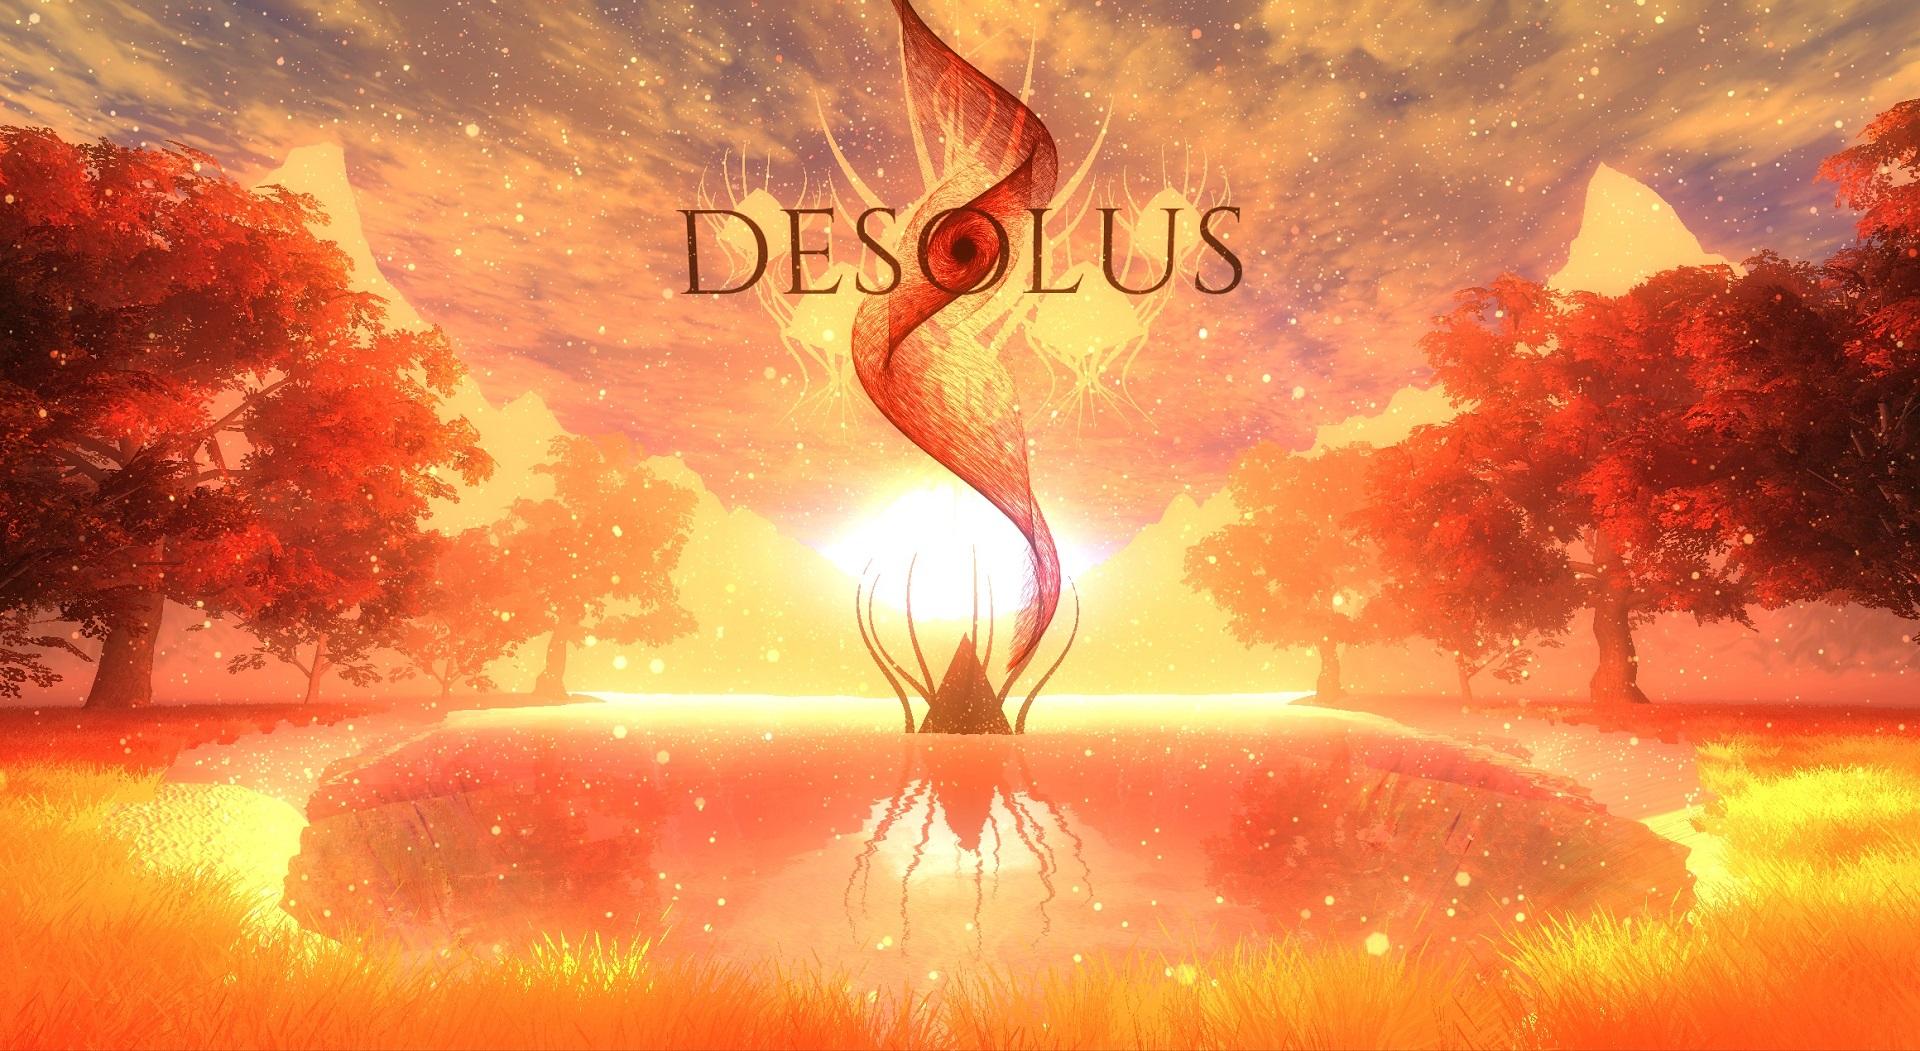 Desolus